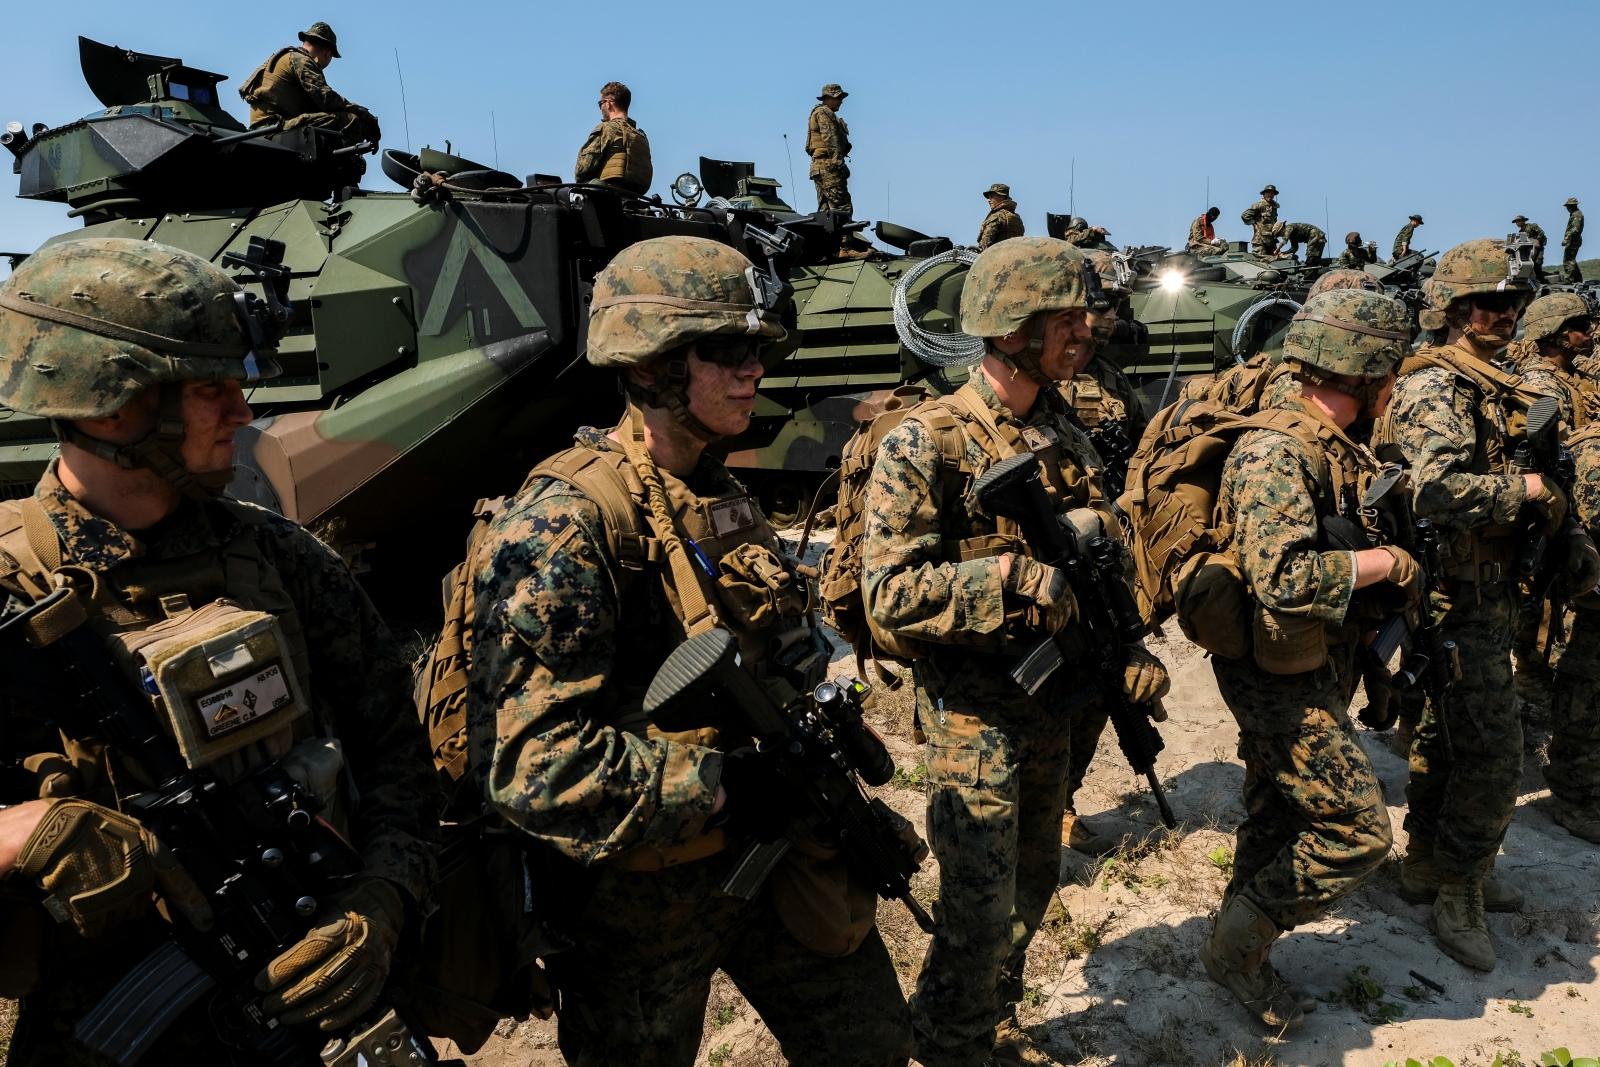 US Marines nude photo scandal: Mattis warns such ...